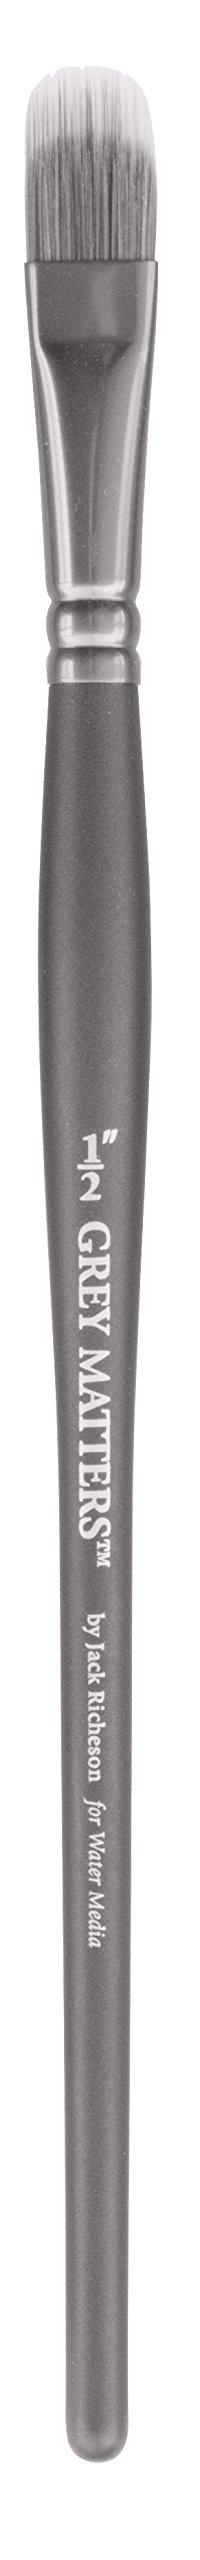 Jack Richeson Richeson Grey Matters Synthetic Filbert Rake 1/2'' by Jack Richeson